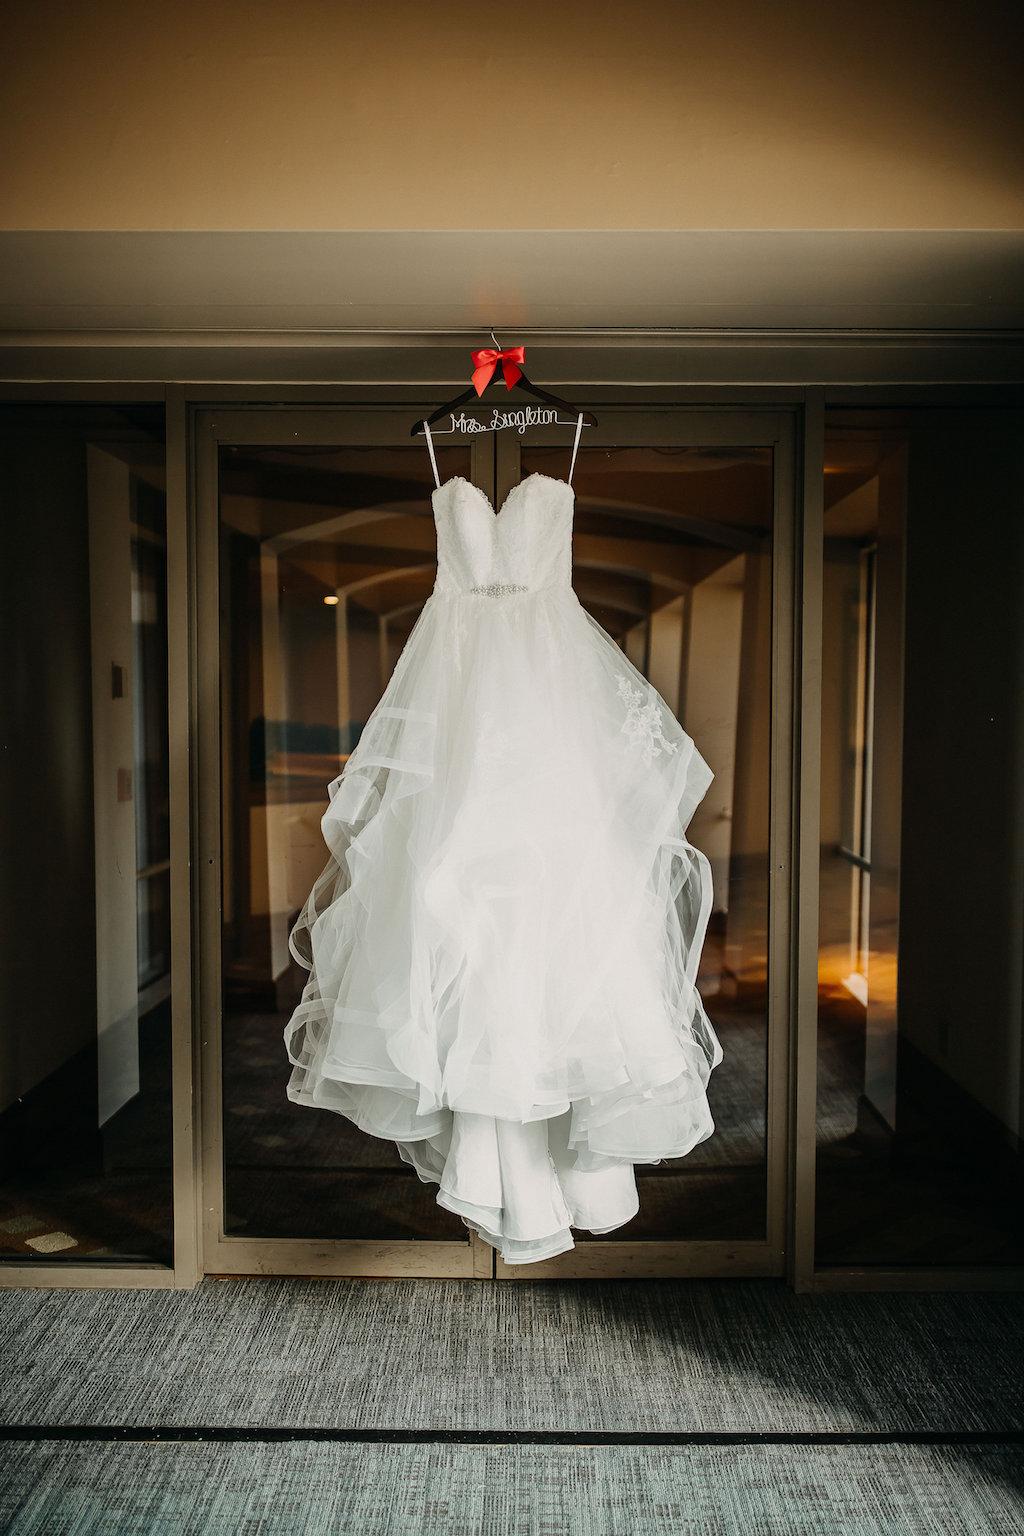 Stella York Sweetheart Ballgown Wedding Dress on Personalized Hanger